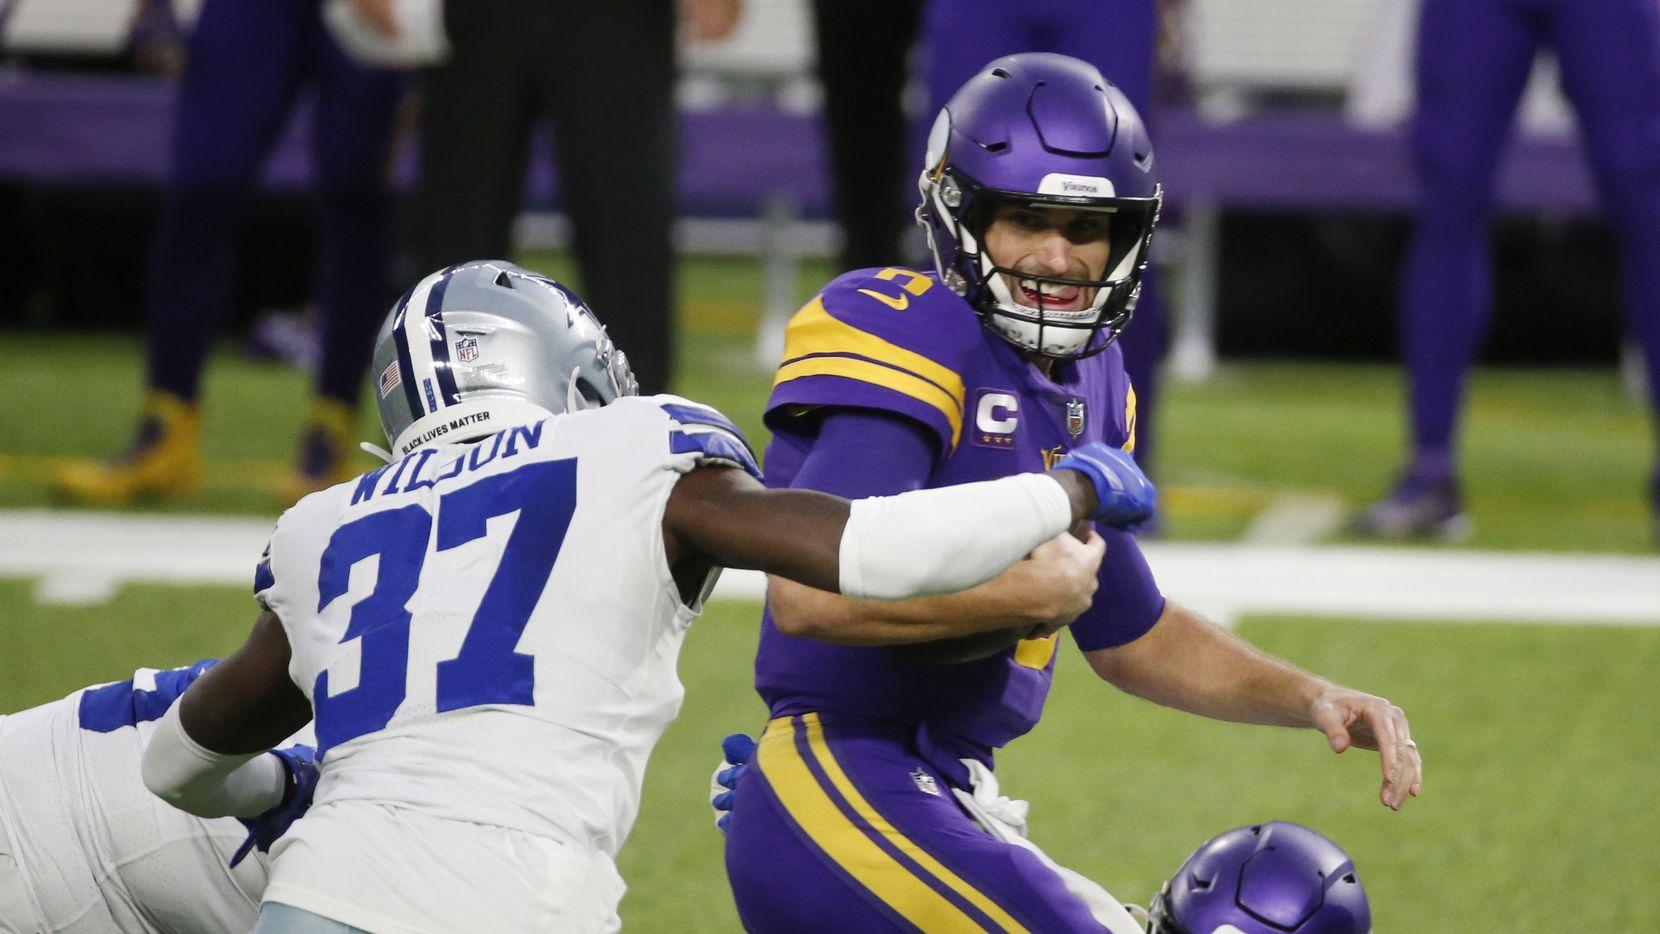 Dallas Cowboys safety Donovan Wilson (37) sacks Minnesota Vikings quarterback Kirk Cousins, right, during the first half of an NFL football game, Sunday, Nov. 22, 2020, in Minneapolis. (AP Photo/Bruce Kluckhohn)